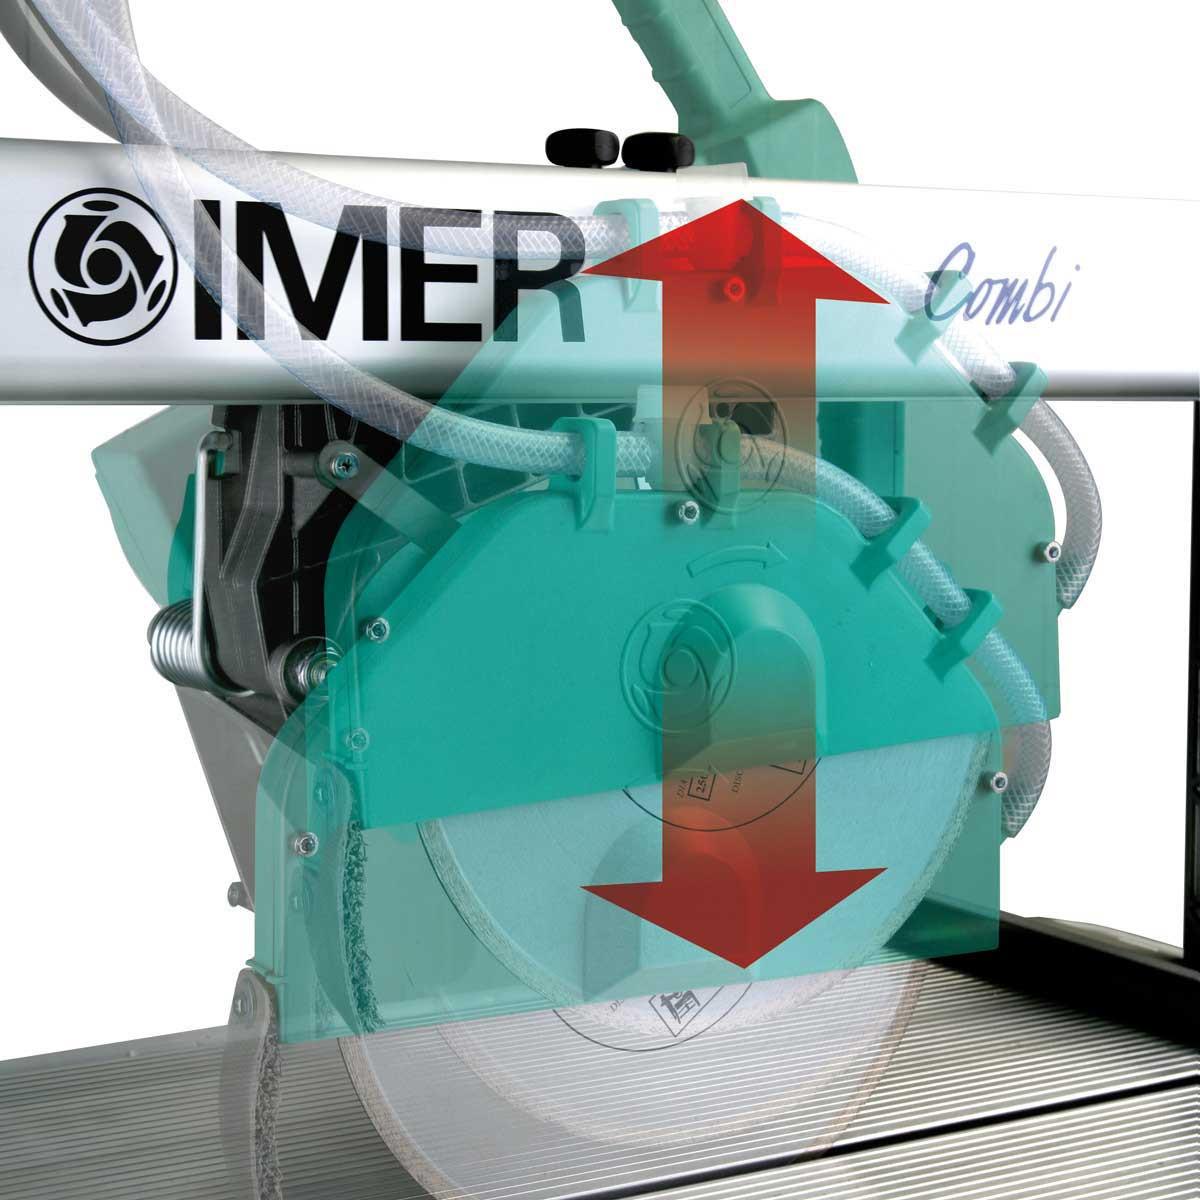 Imer Combi rail saw plunge cut capability